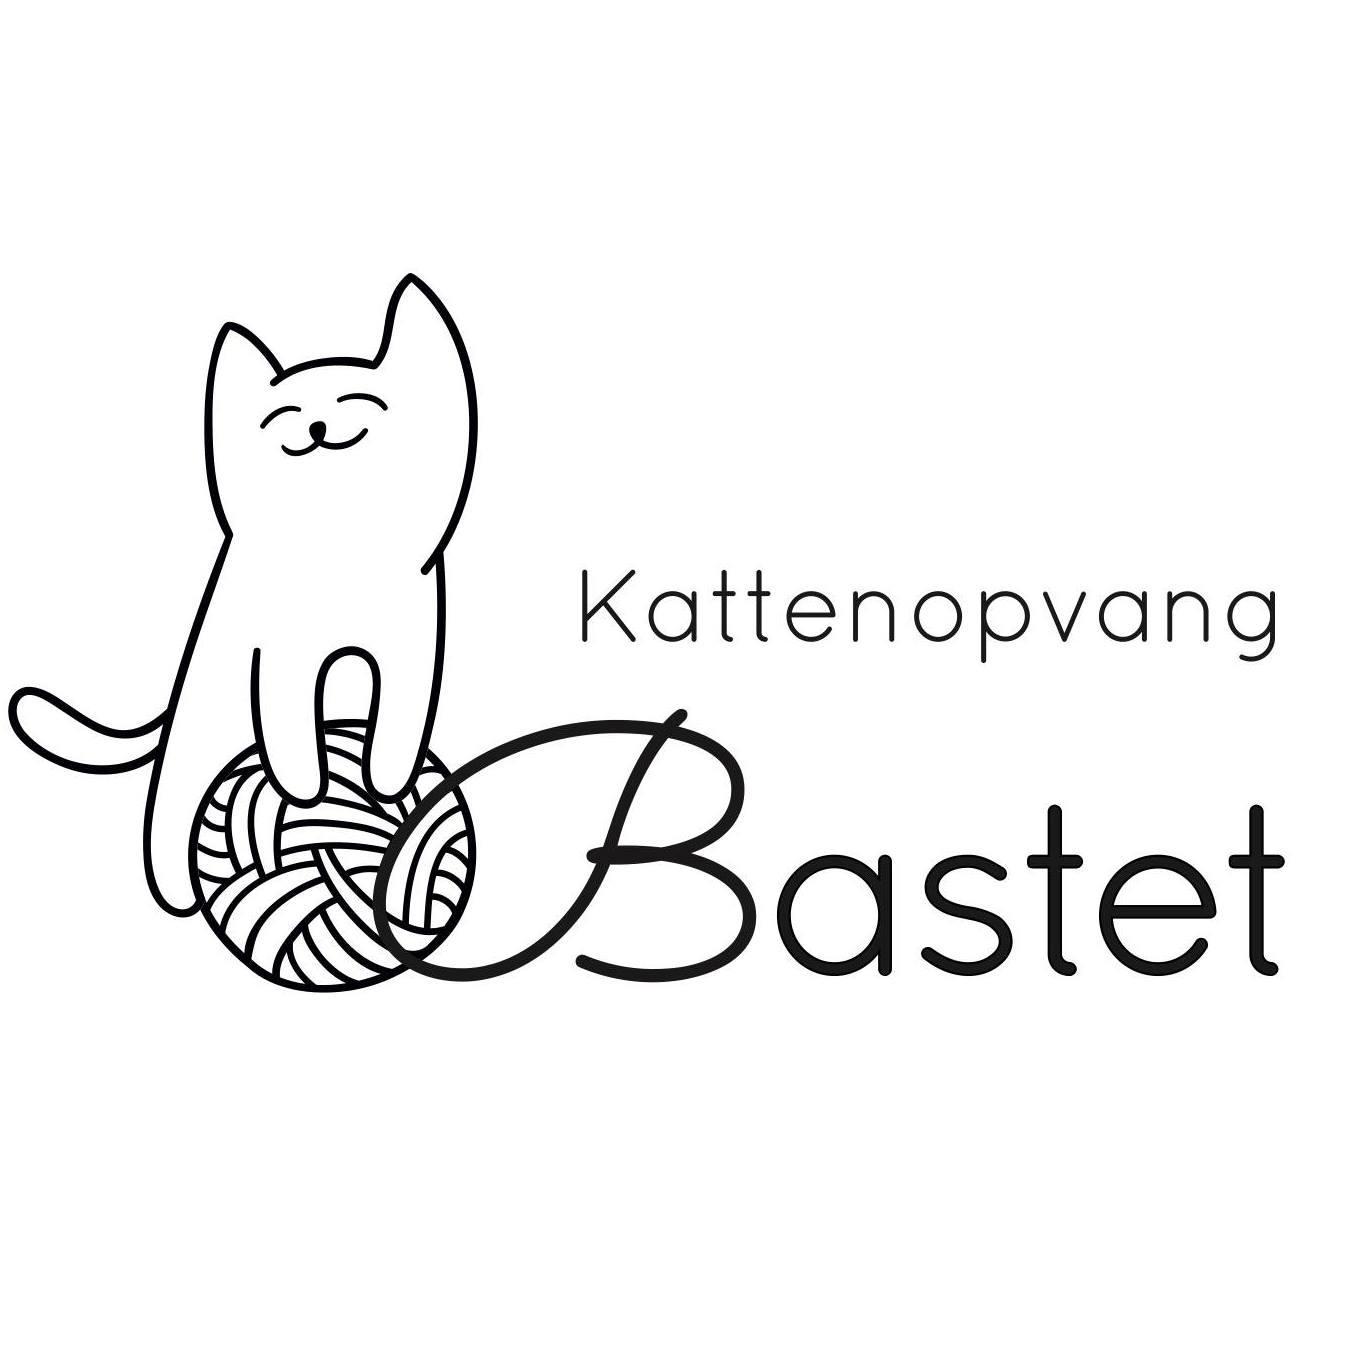 STICHTING KATTENOPVANG BASTET